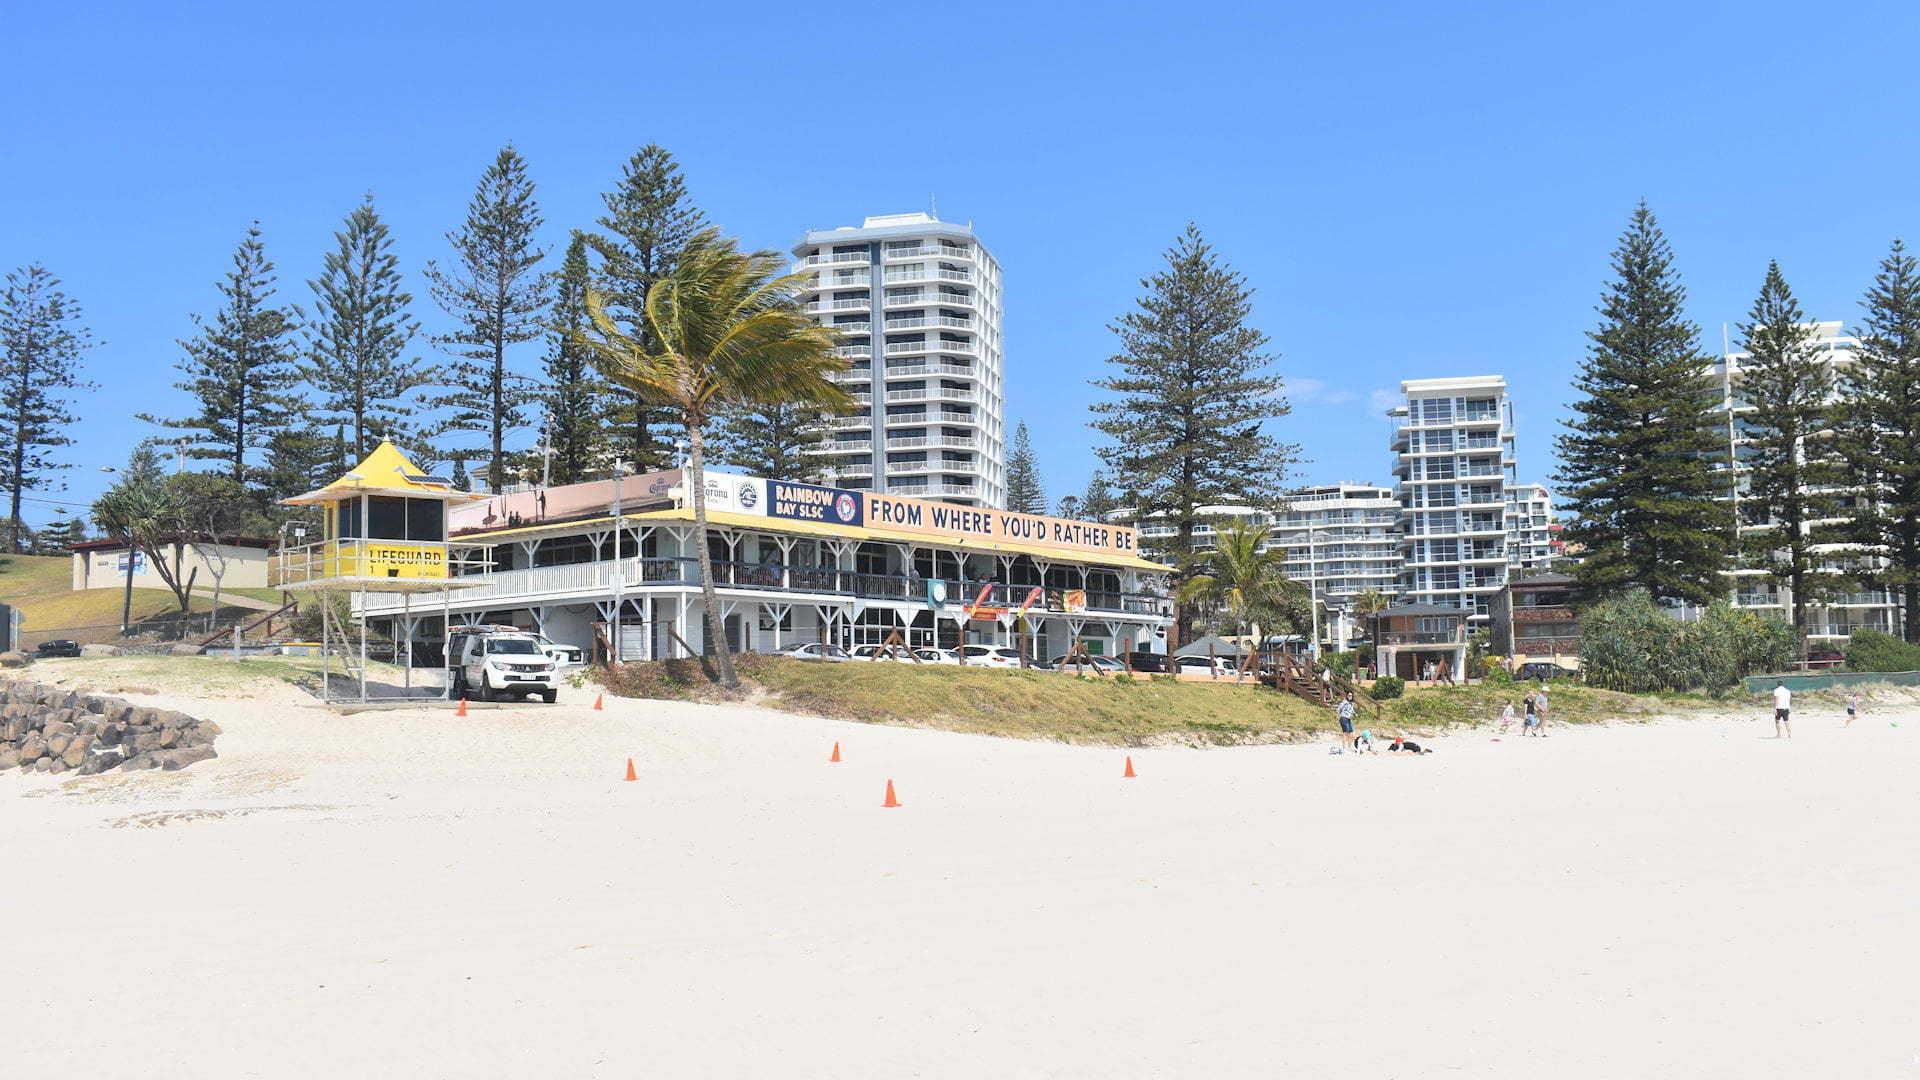 Surf club house at Coolangatta on Greenmount Beach, the Rainbow Bay Surf Club